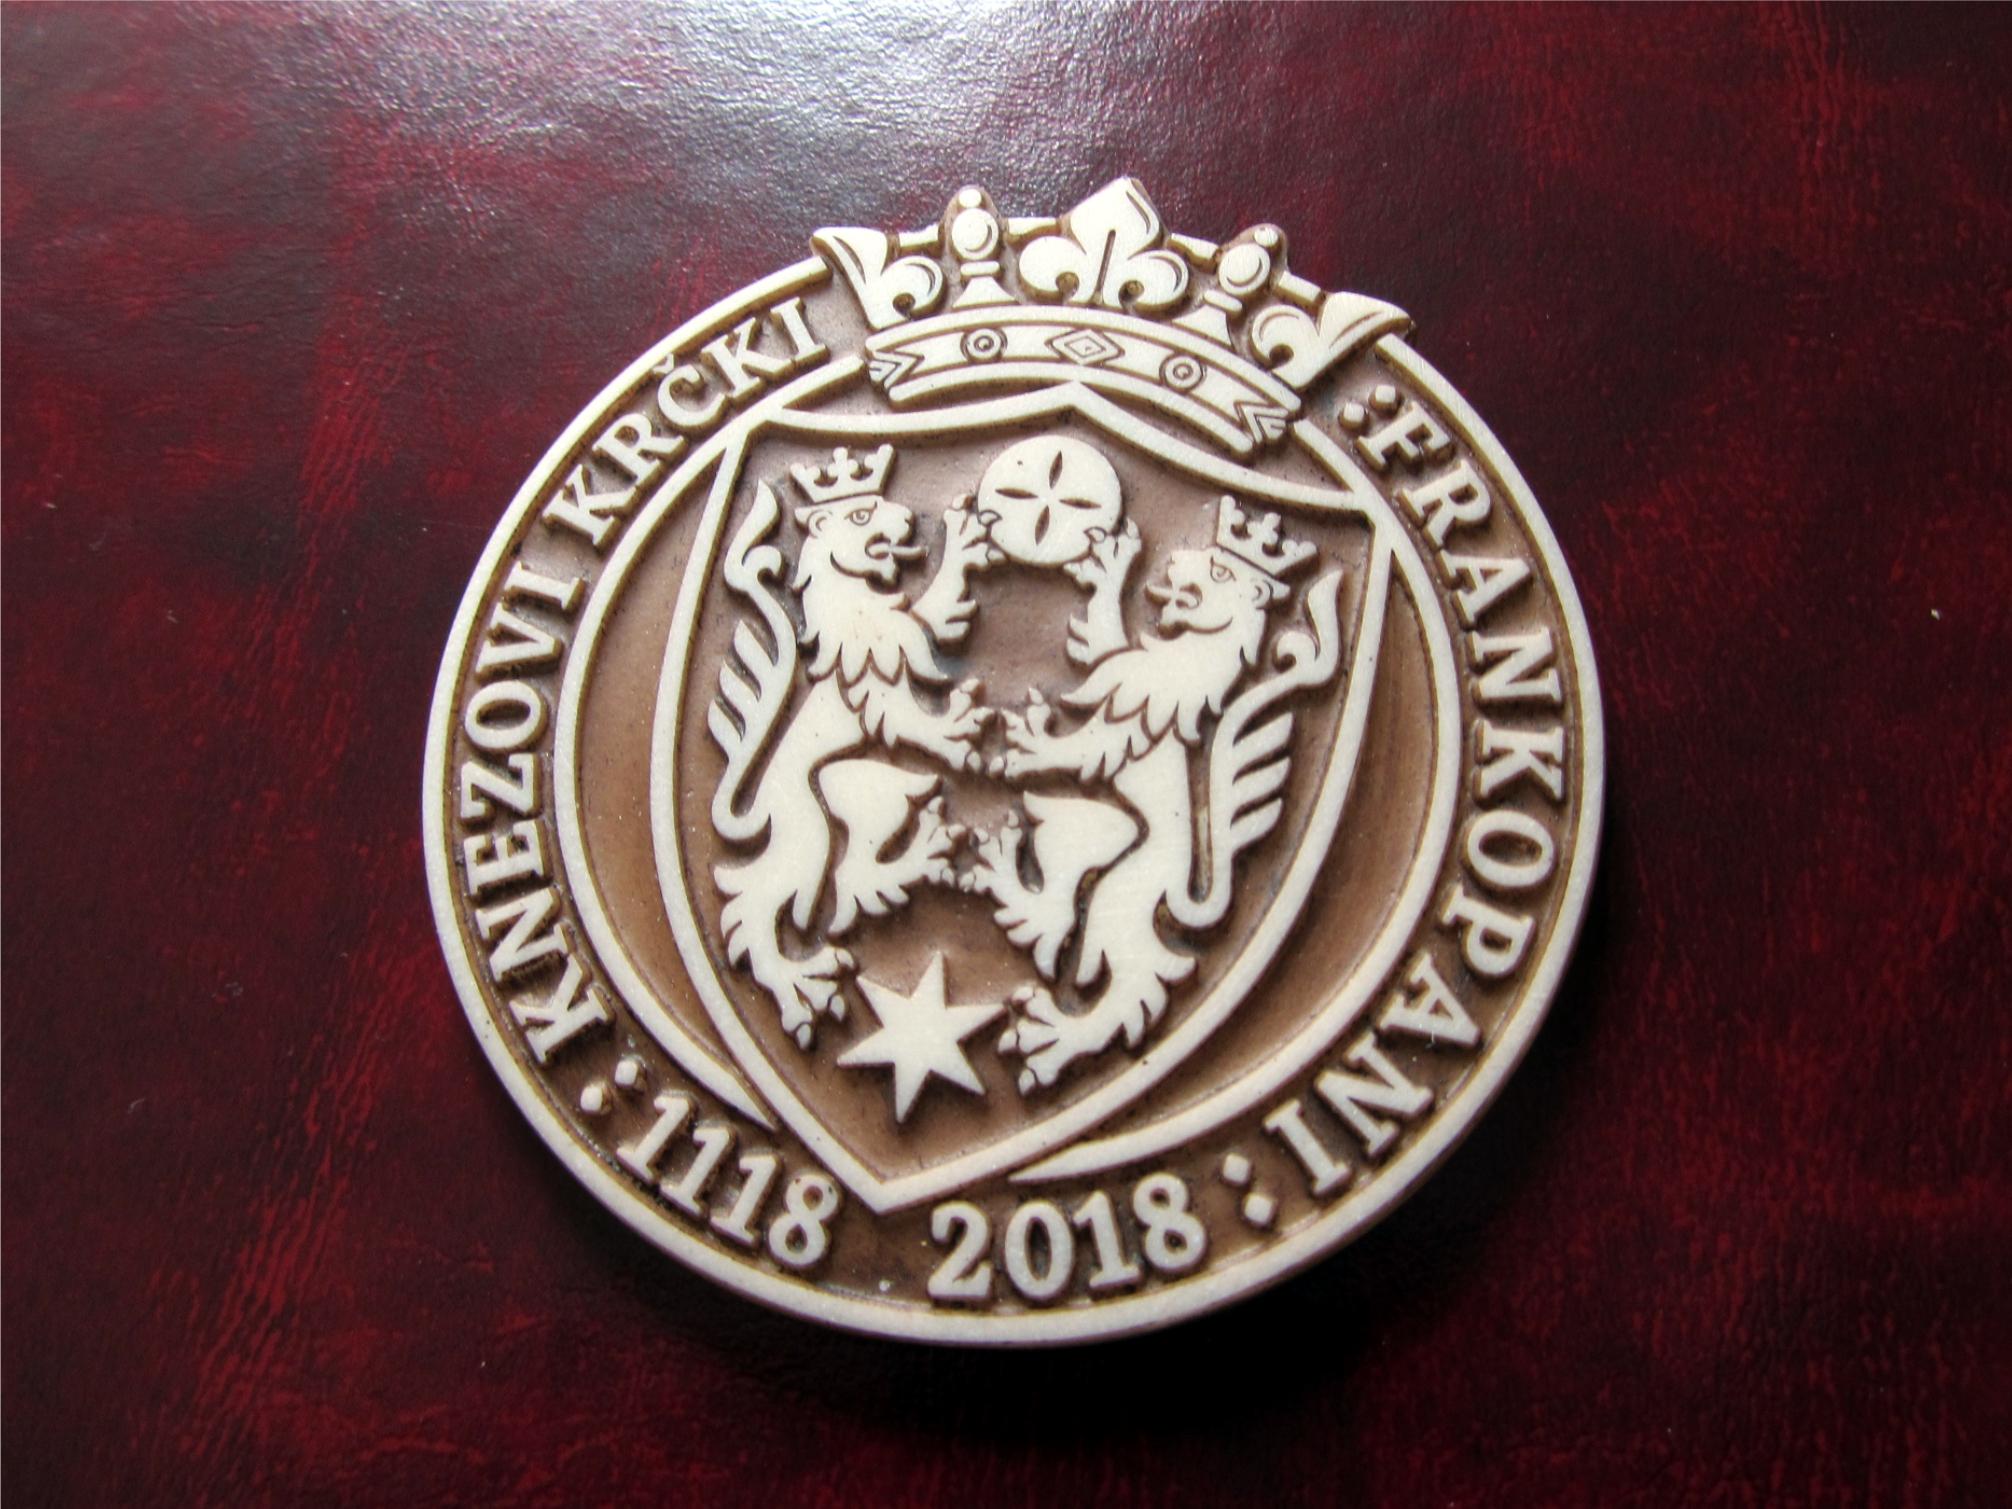 Logo design and production of souvenir magnet for the 900 years of Frankopan family universary.   Logo dizajn i izrada magneta - suvenira povodom obljetnice 900 godina Frankopana.